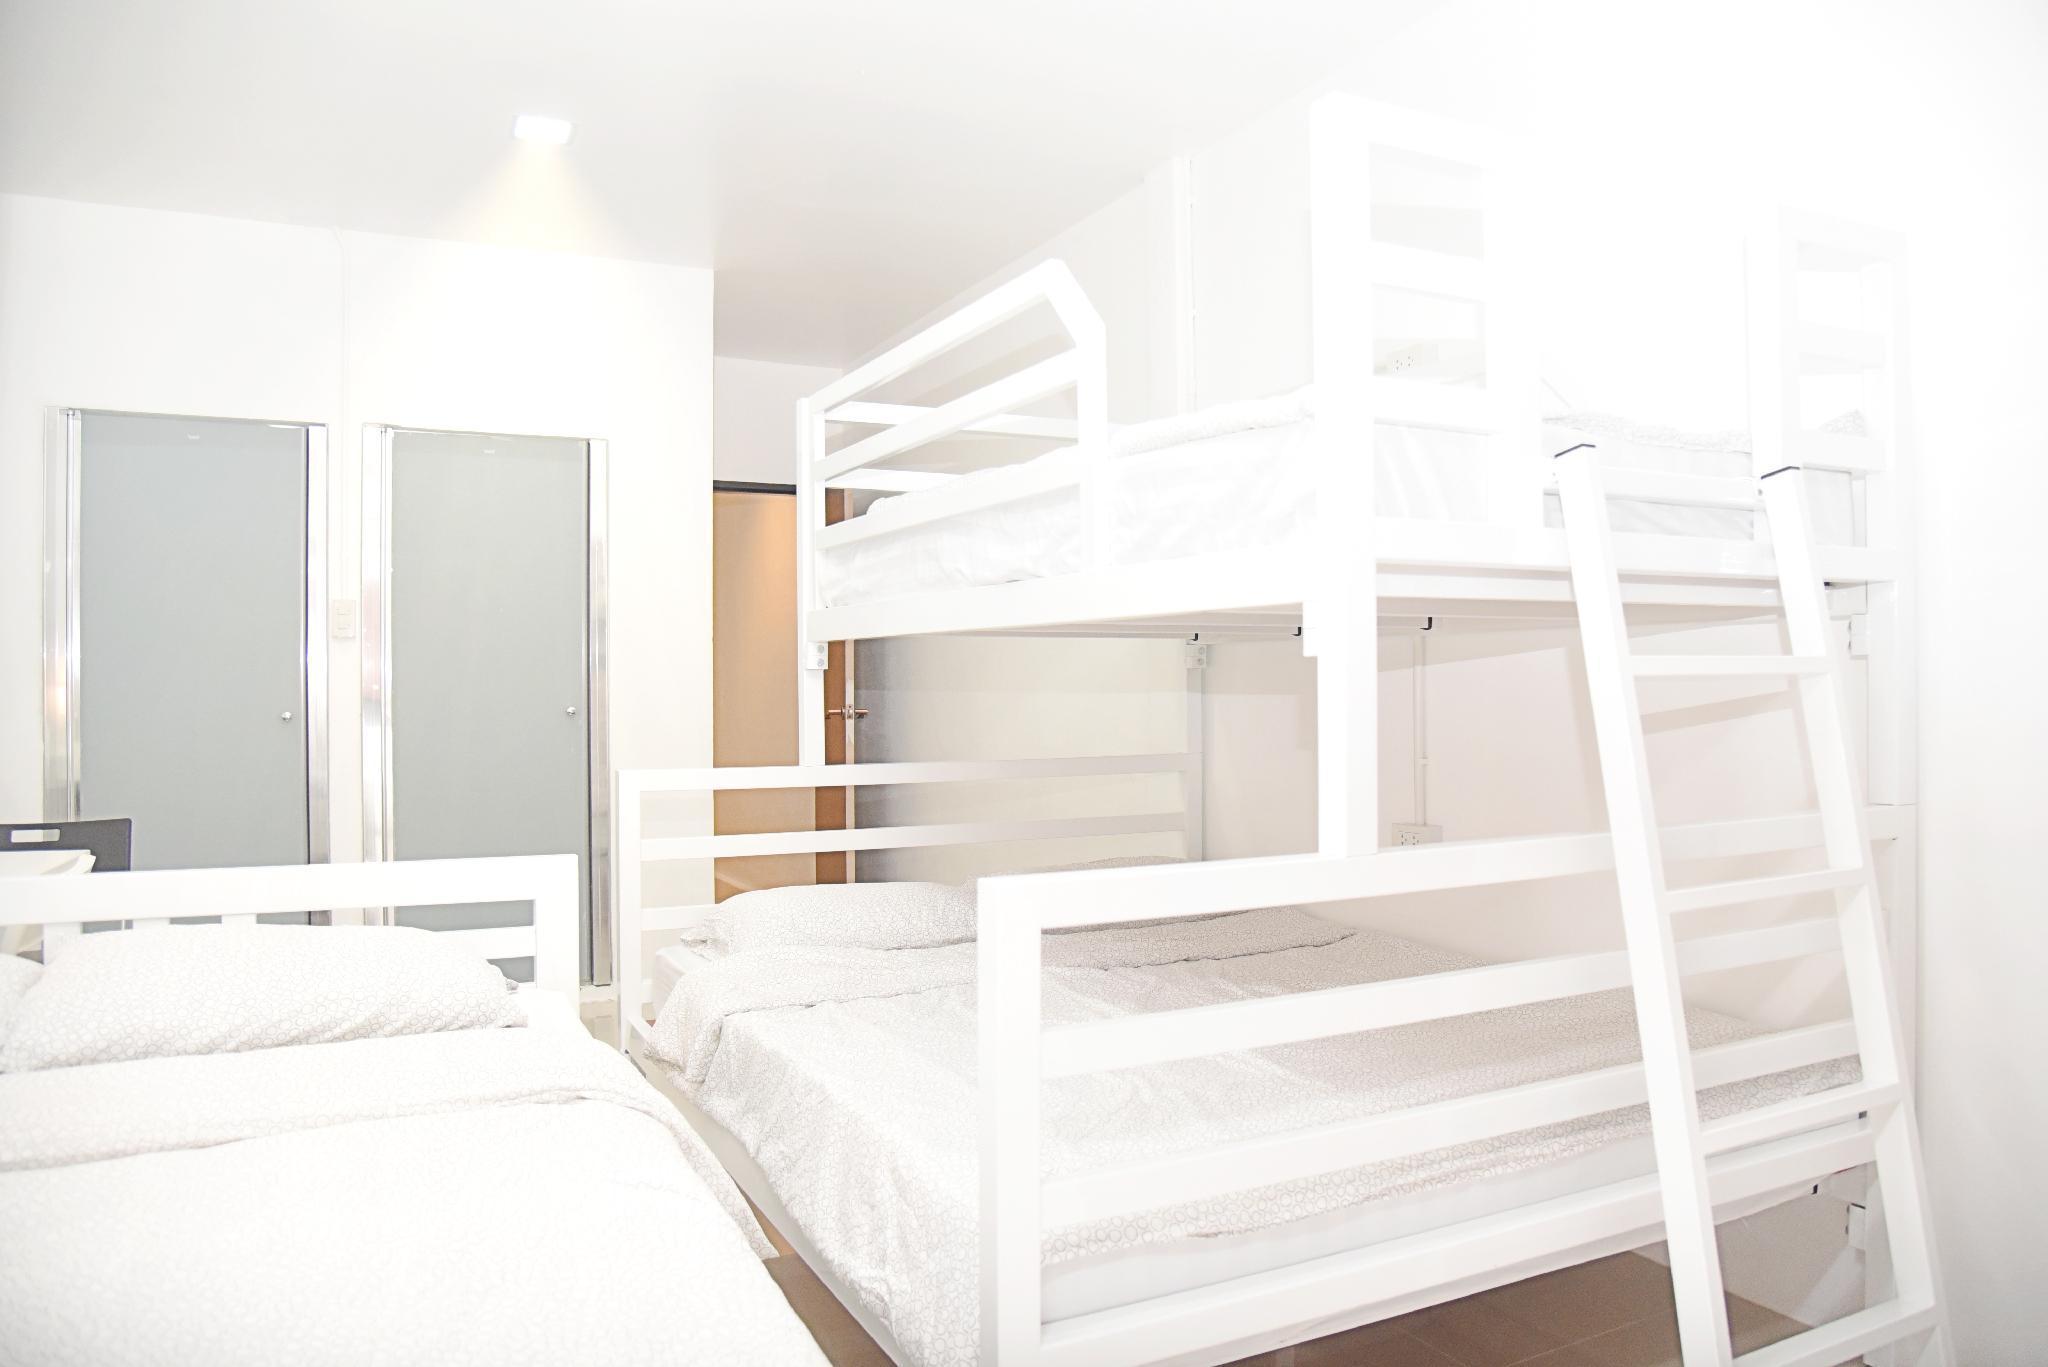 designerhome301 บ้านเดี่ยว 1 ห้องนอน 2 ห้องน้ำส่วนตัว ขนาด 18 ตร.ม. – ธนบุรี